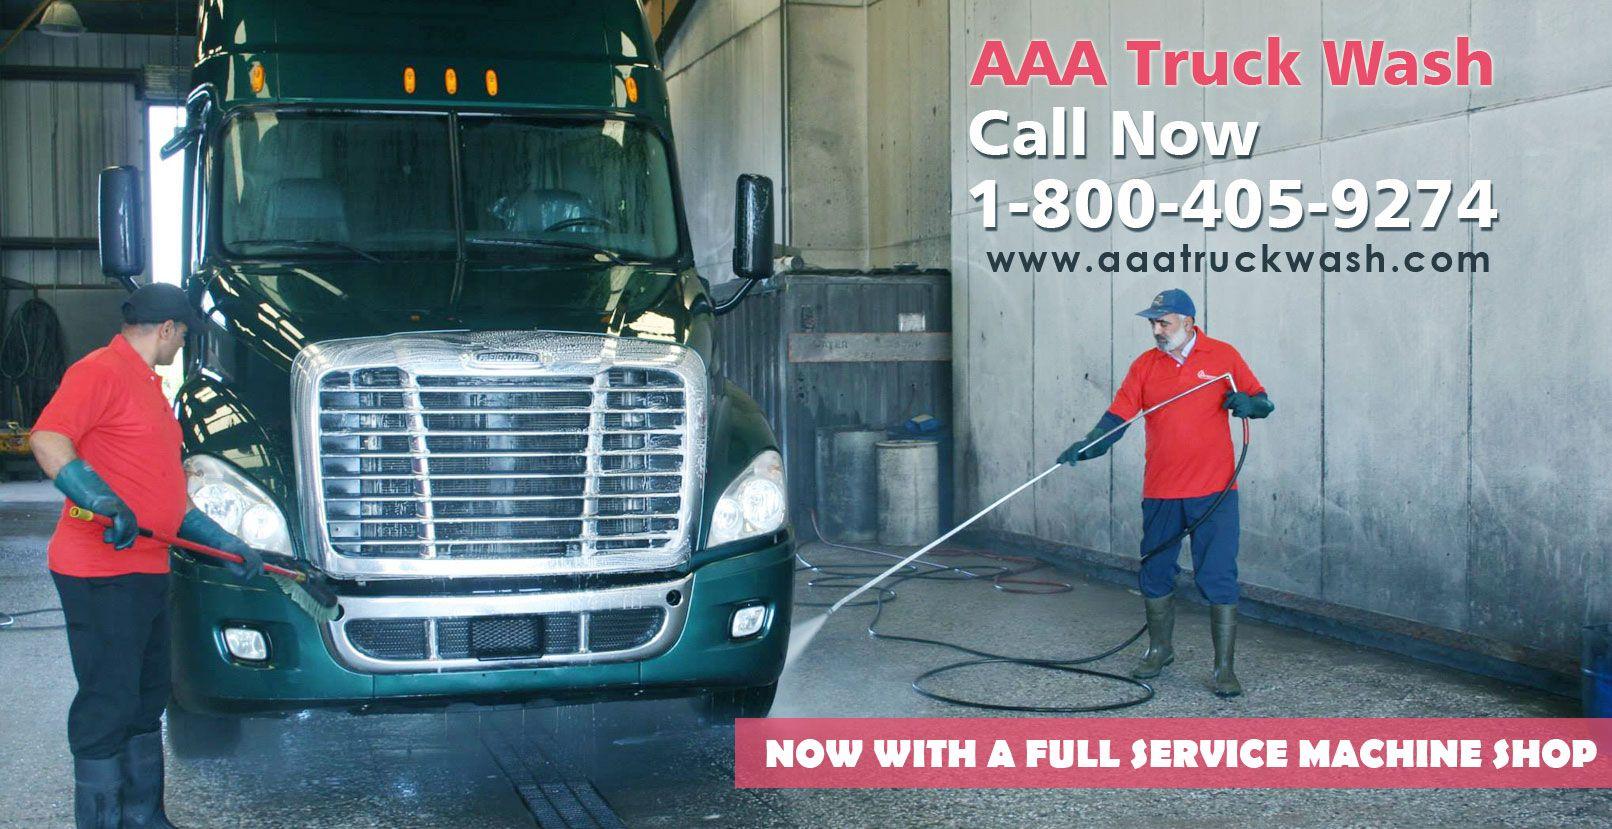 AAA Truck Wash located in Texas, Missouri and California